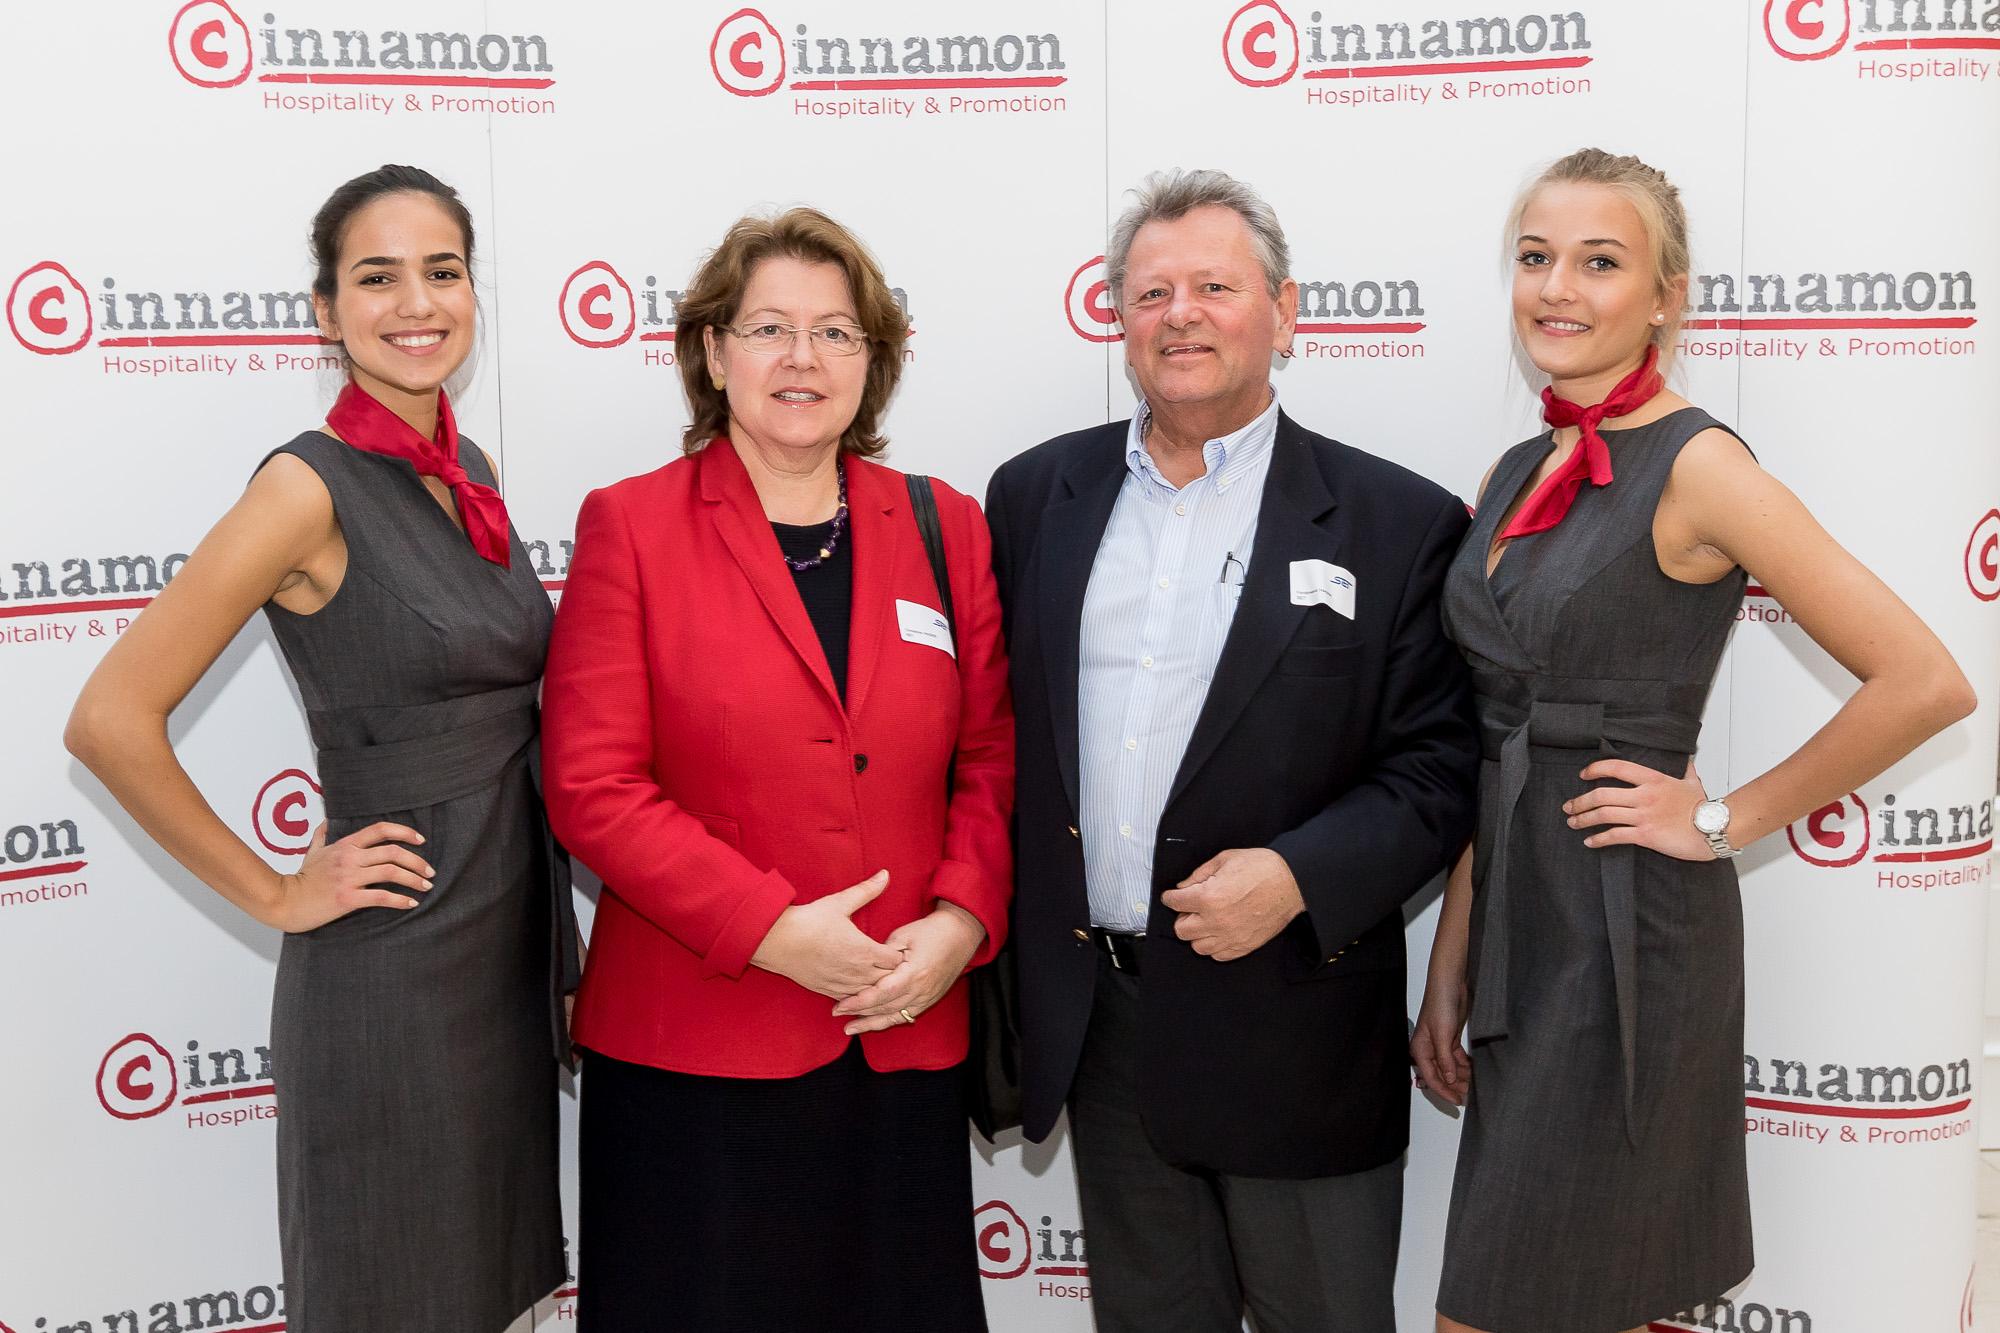 ©HLA/Sebastian Pucher - mit cinnamon Hospitality